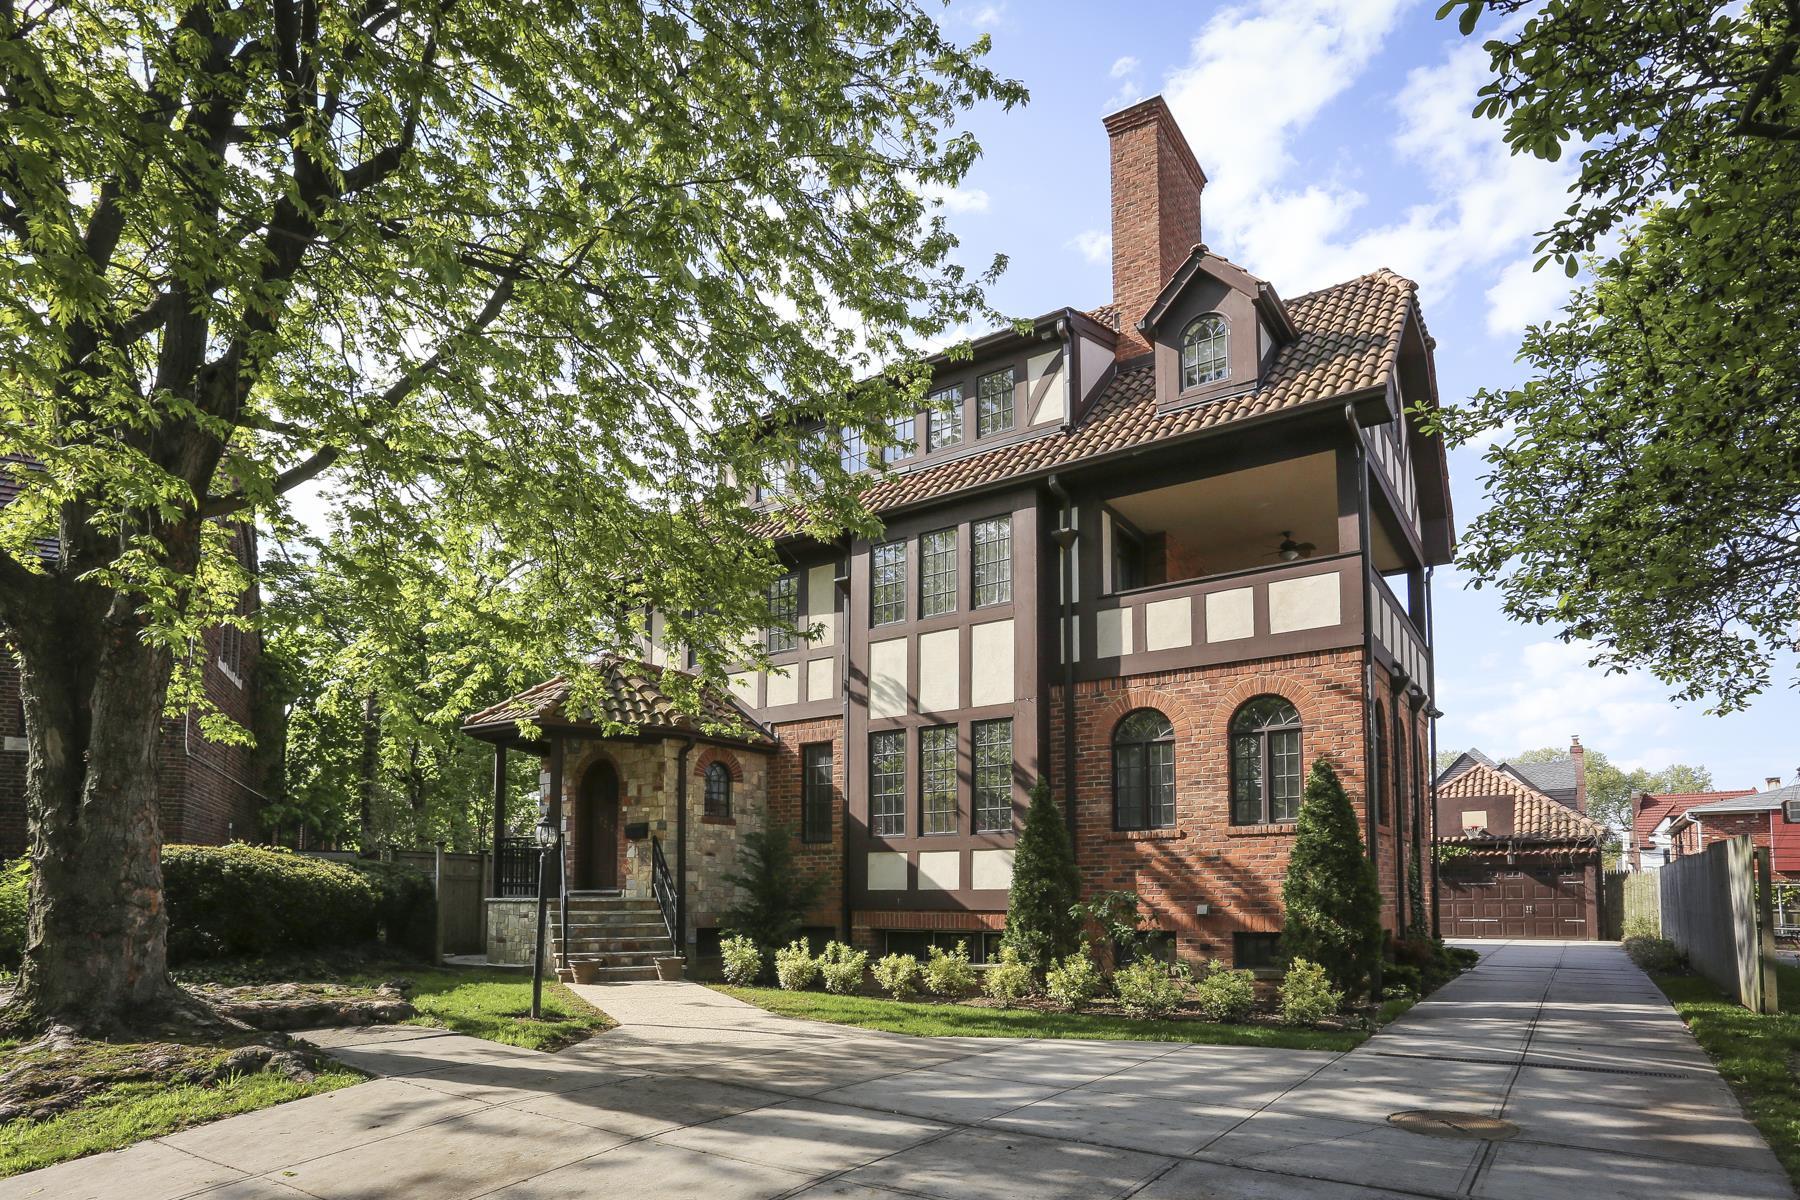 Robert Hof Real Estate Associate In Forest Hills New York Sotheby 39 S International Realty